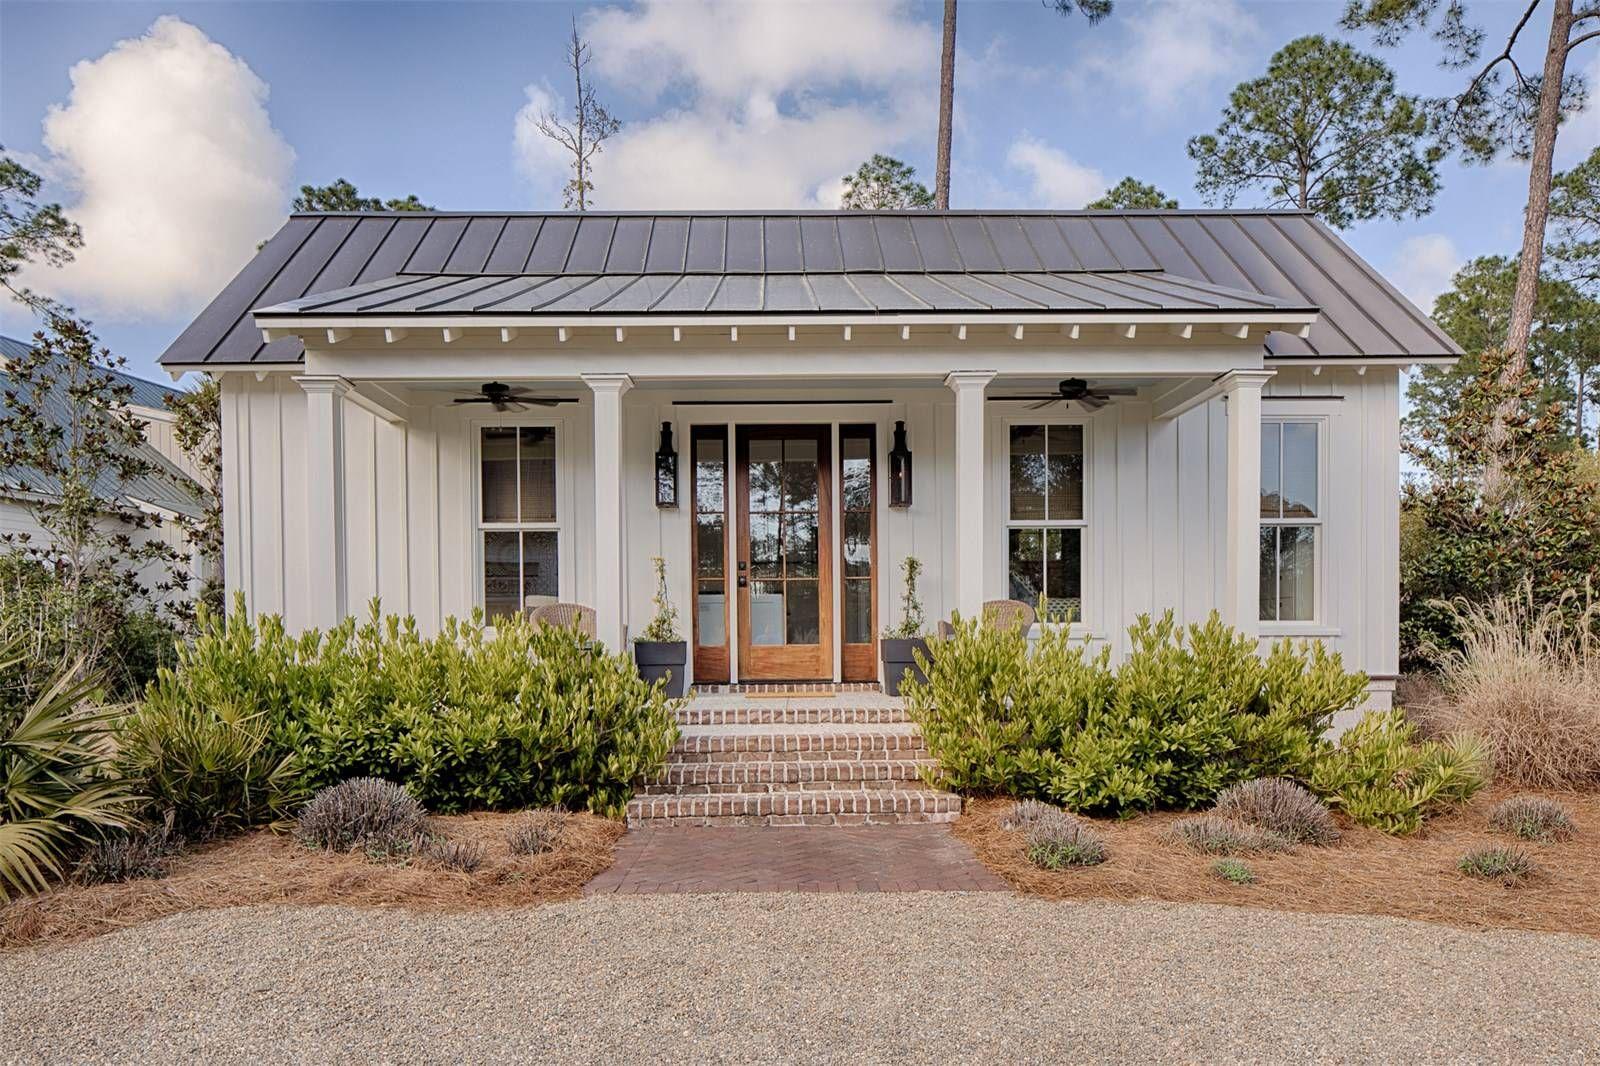 Coastal Cottage Interior Design Inspiration Part 1 Get The Look